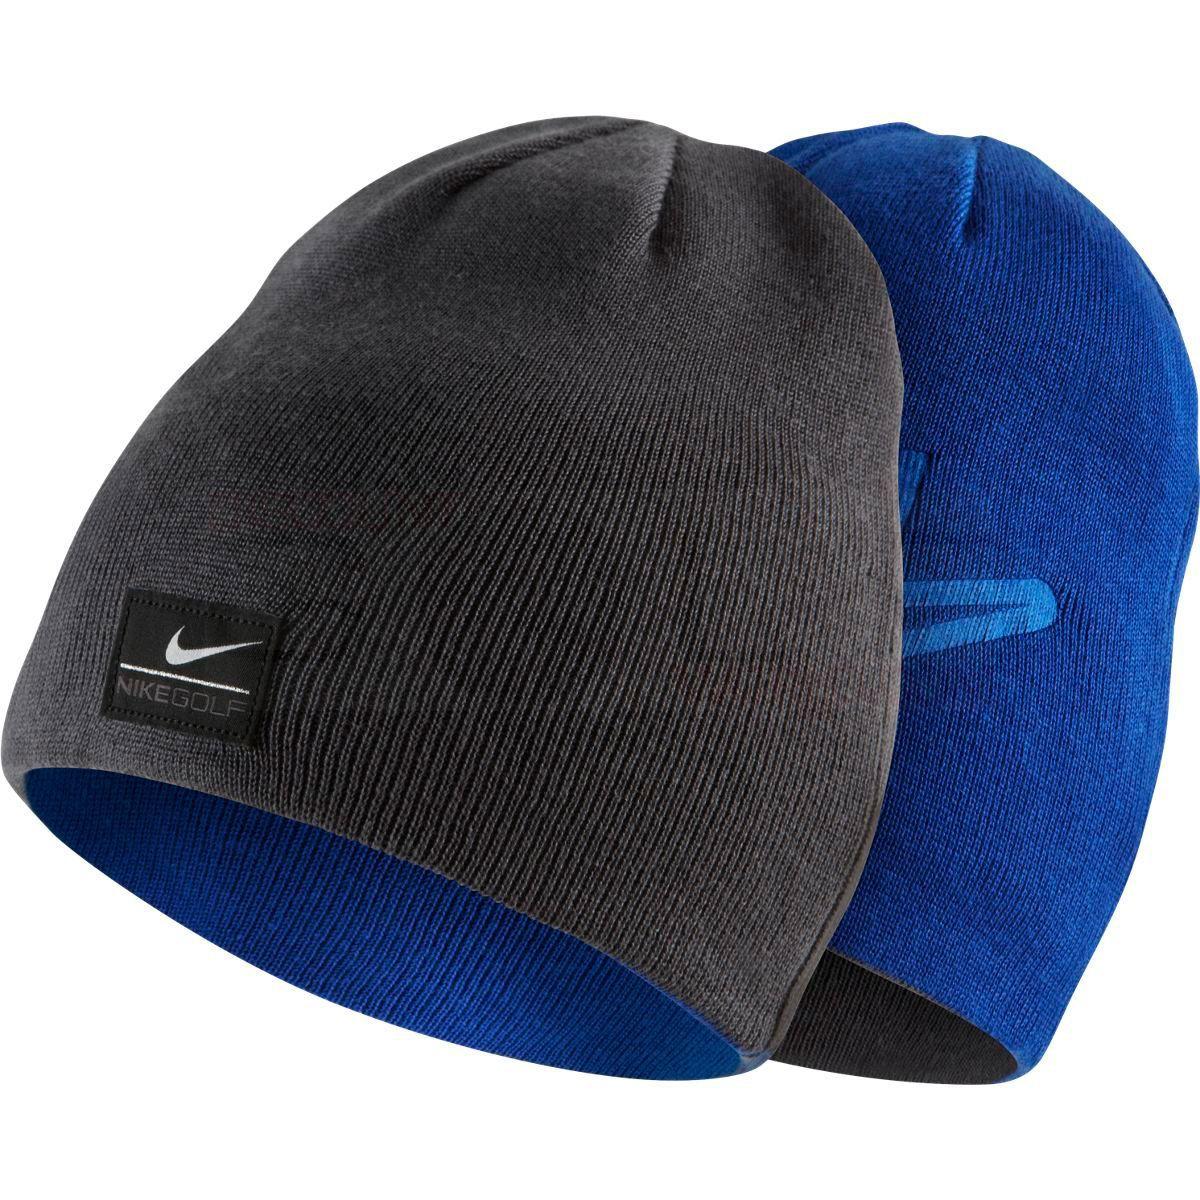 a153f056b6f Nike Reversible Knit Cap 619430